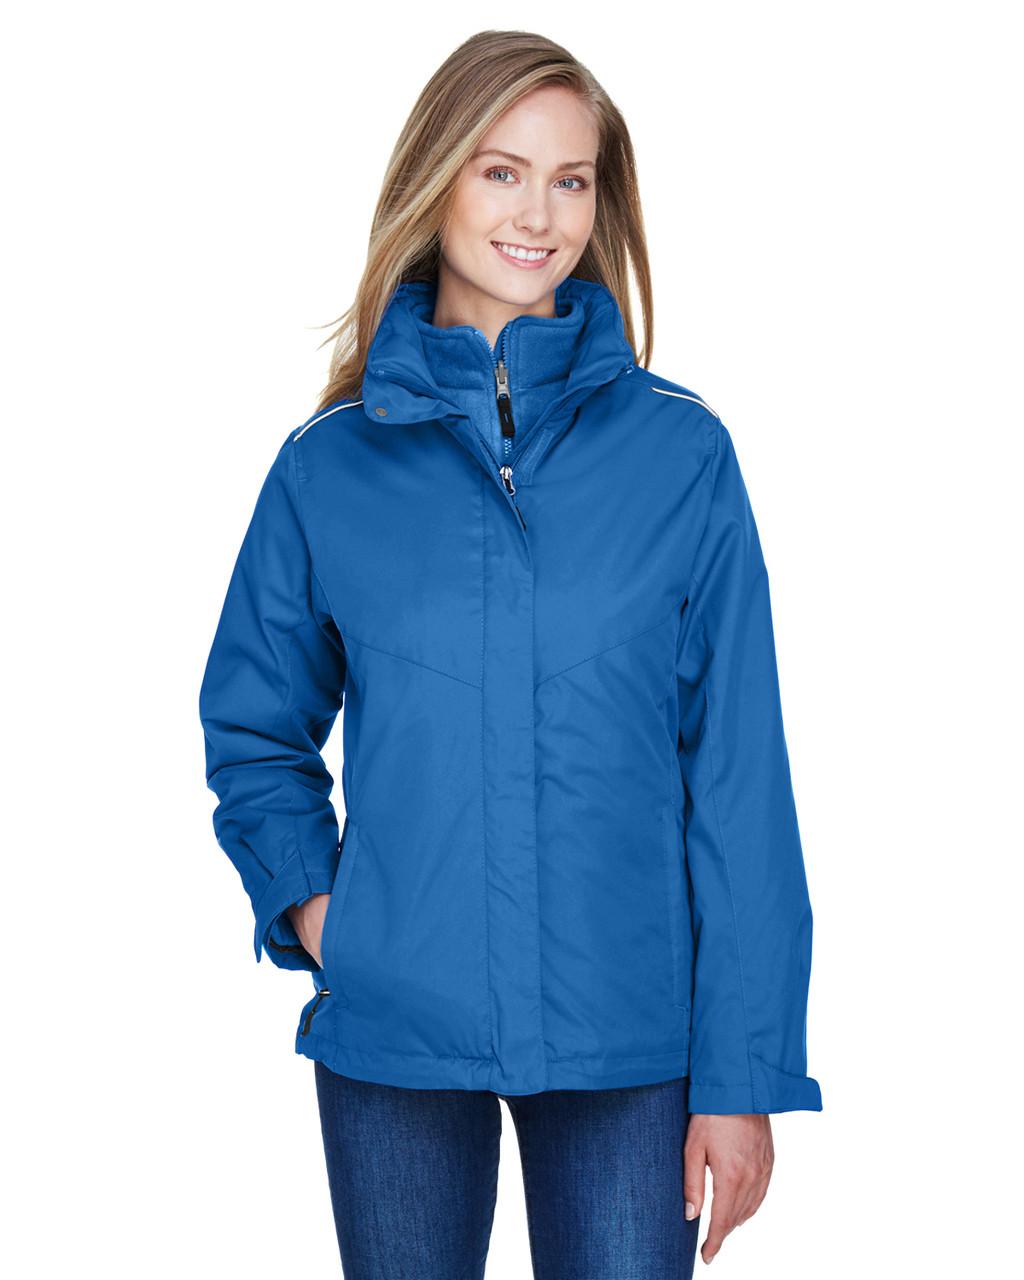 0cb359ab6 Ash City - Core 365 78205 Ladies' Region 3-in-1 Jacket with Fleece Liner